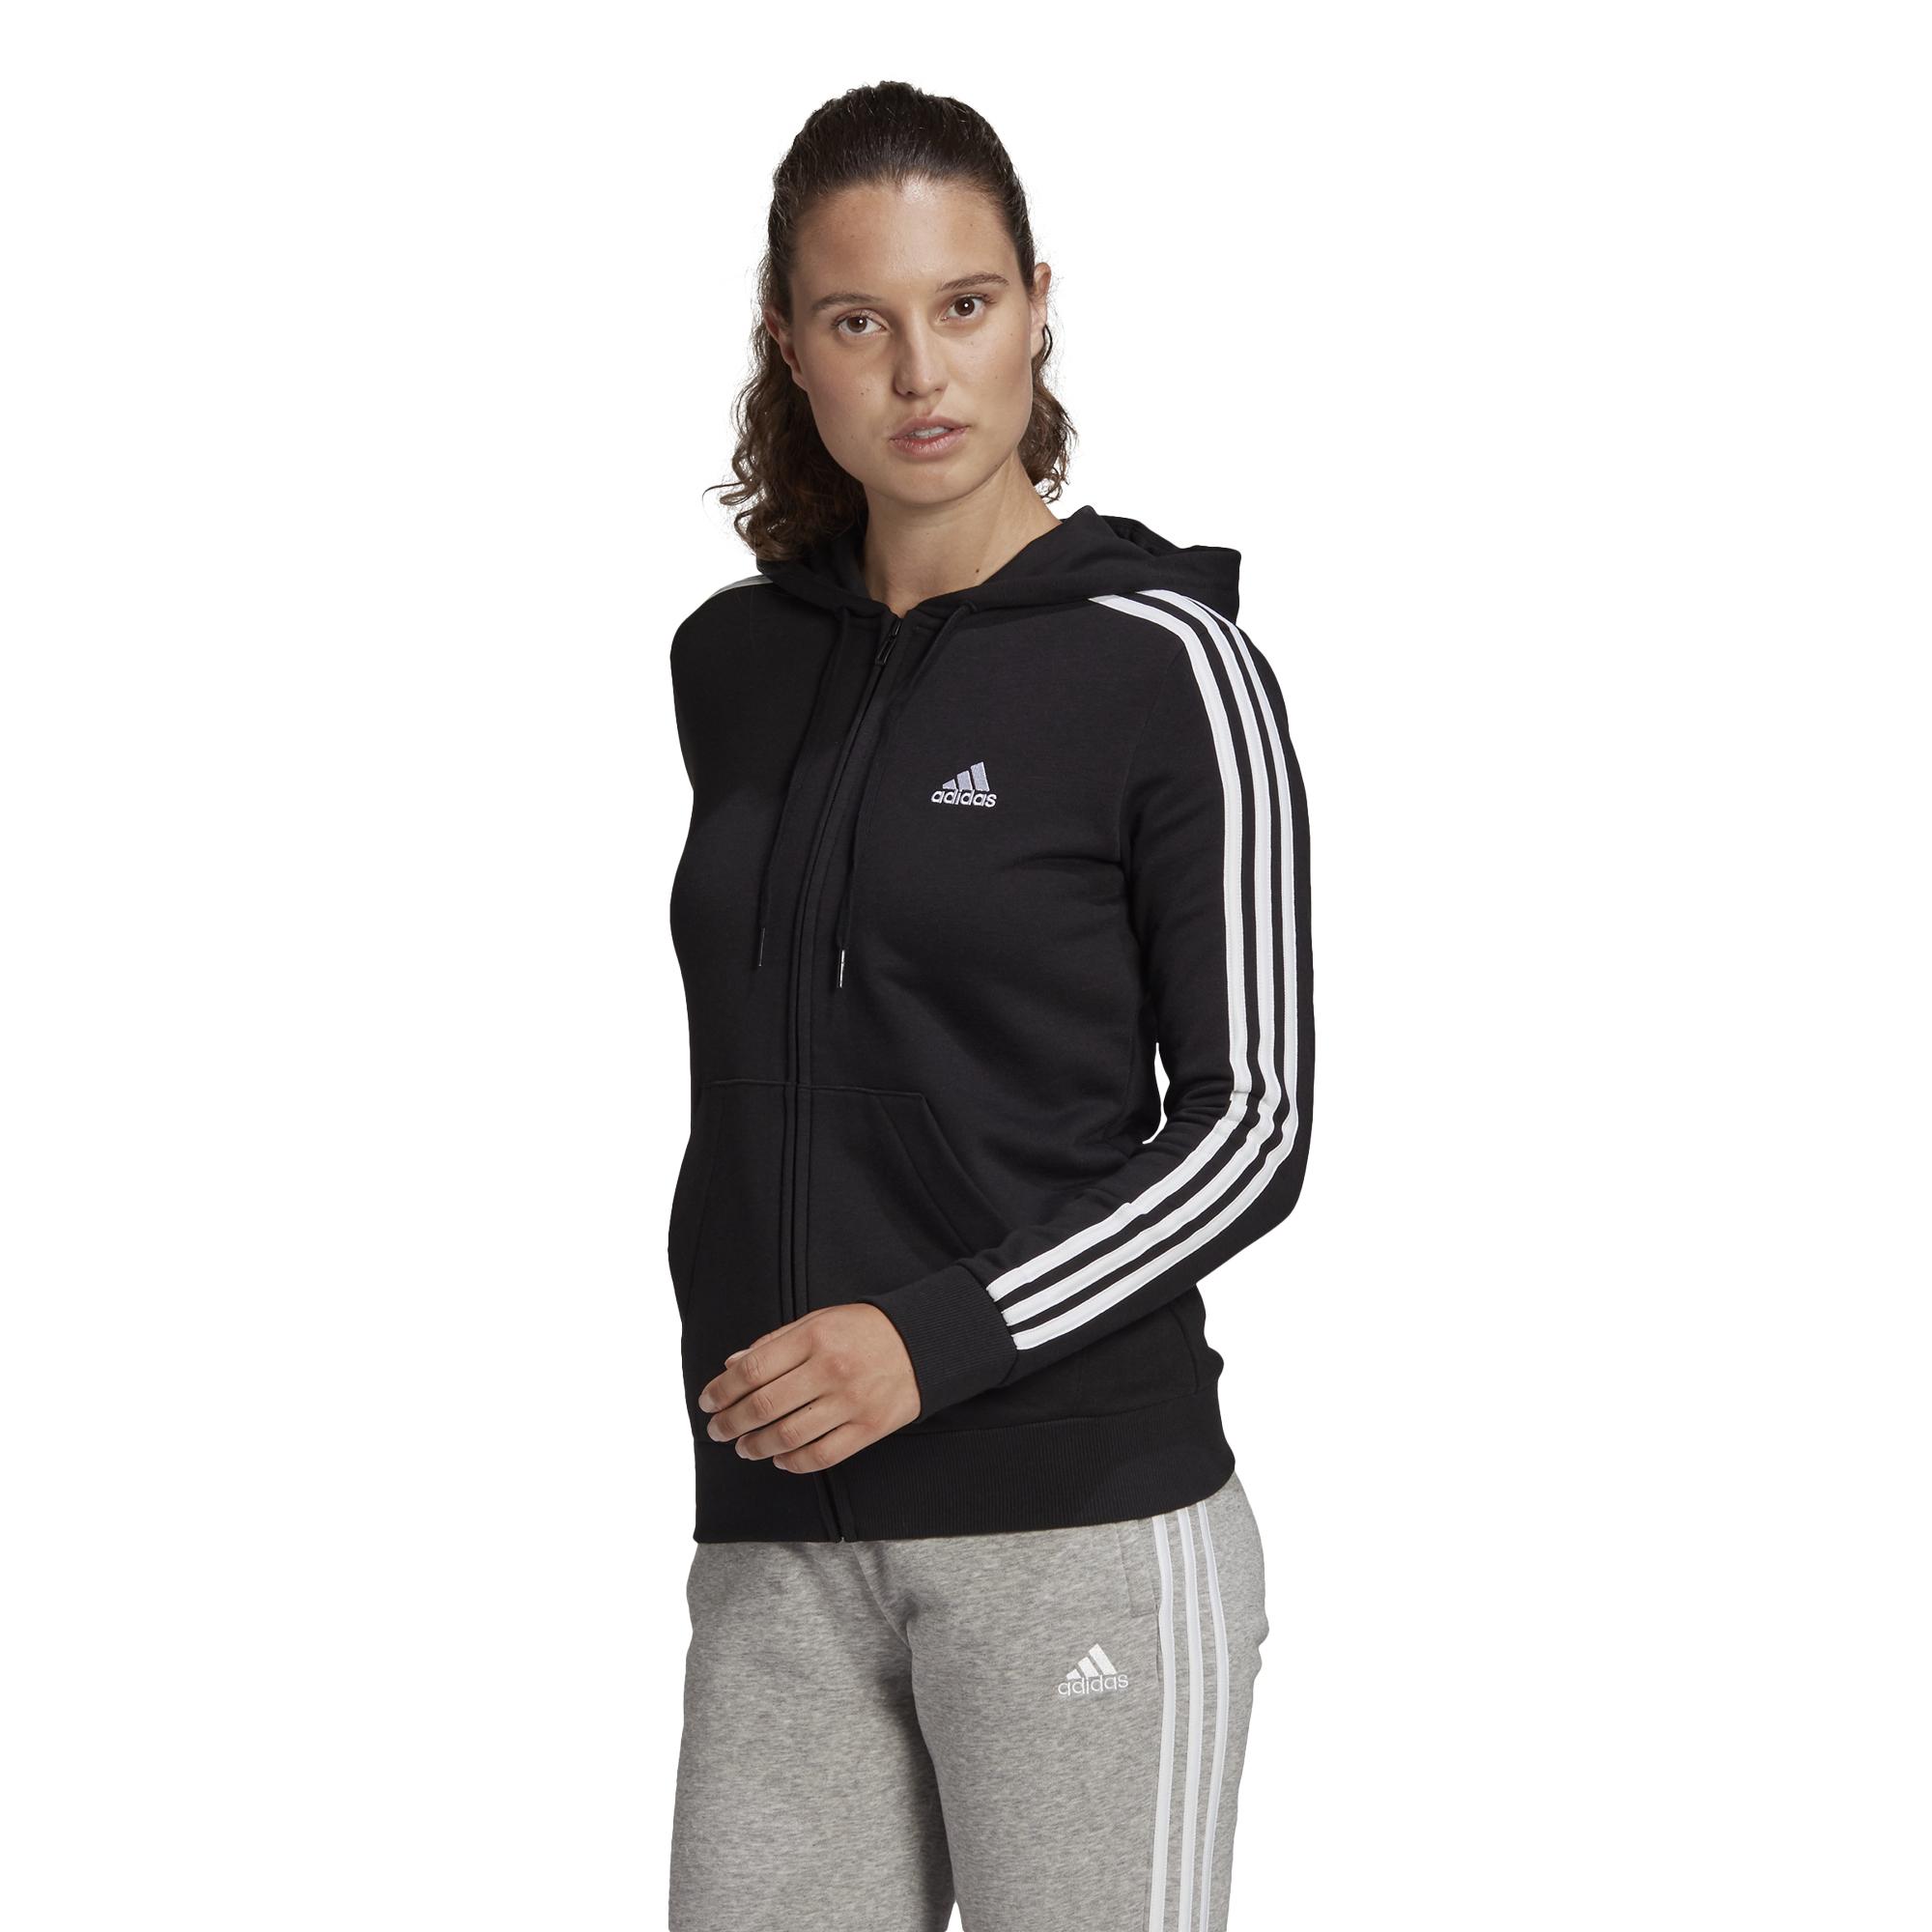 Felpa adidas con cappuccio Essentials French Terry 3-Stripes Full-Zip ADIDAS PERFORMANCE | 92 | GL0792-